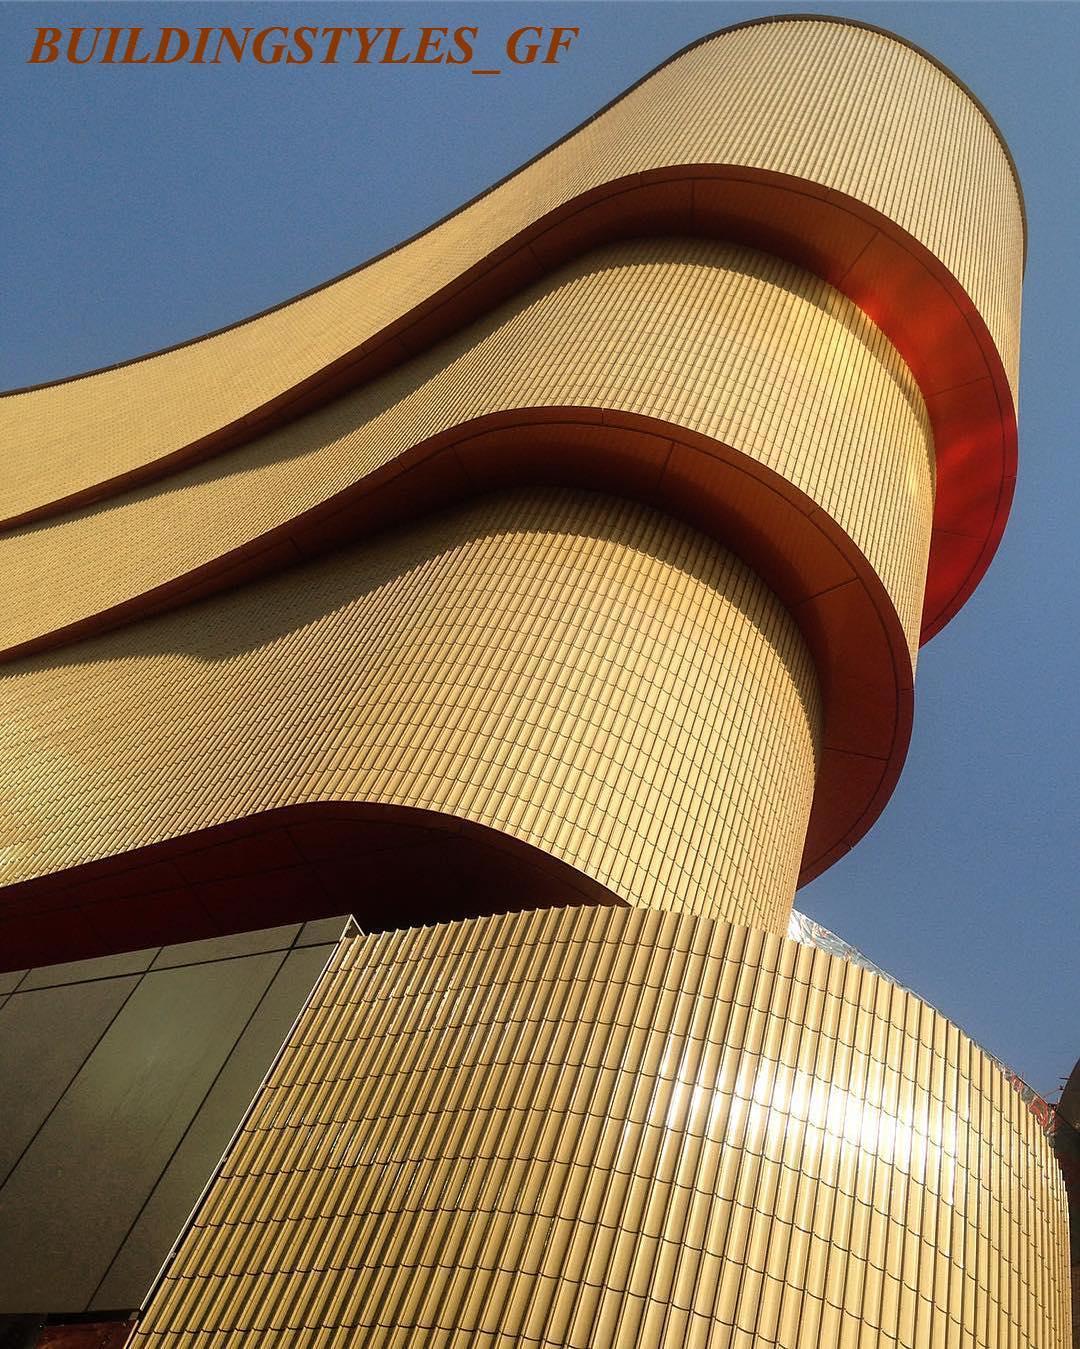 imagenes-de-edificios-modernos1109